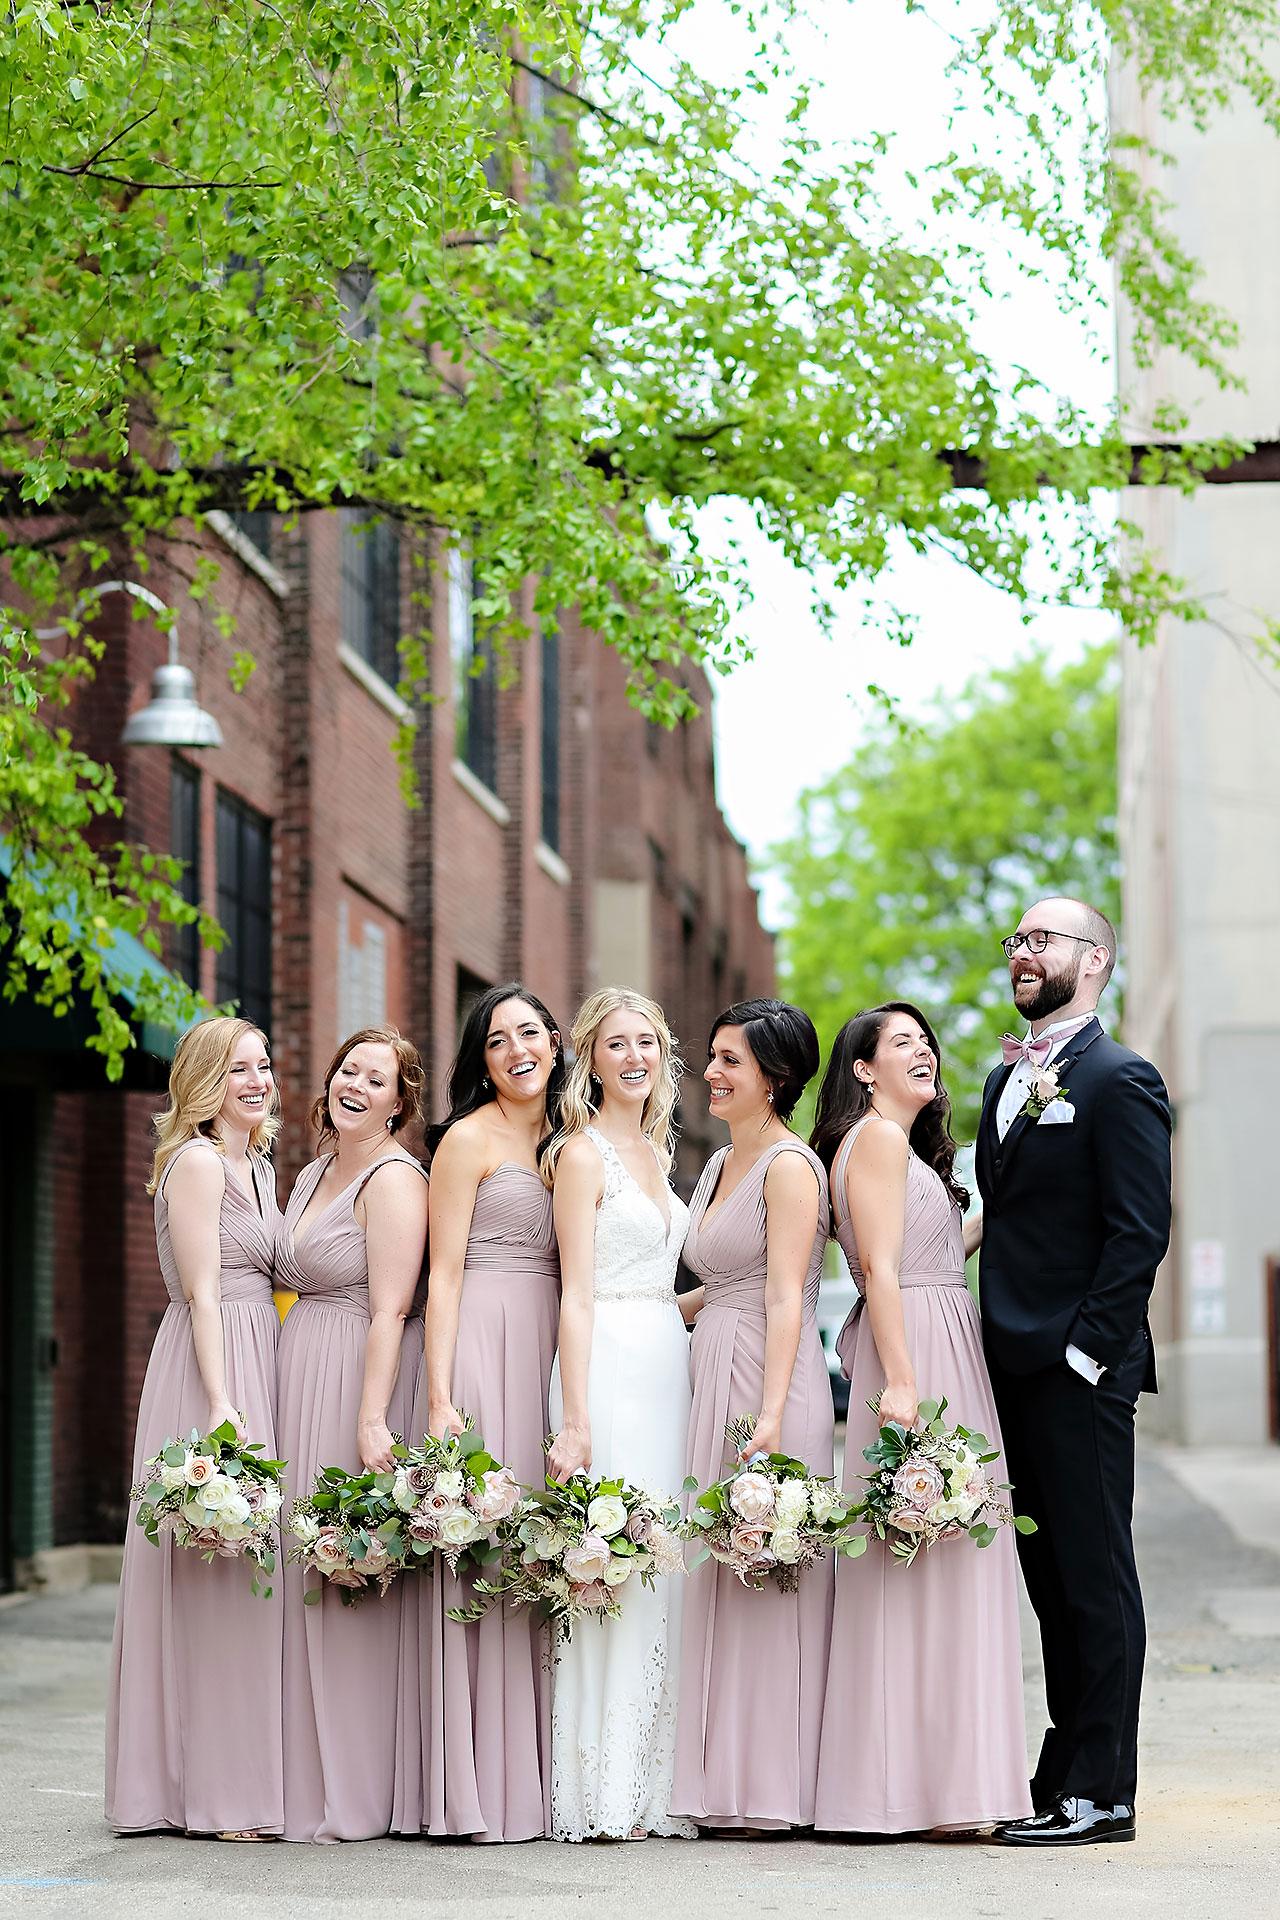 Allison Jeff Union Station Crowne Plaza Indianapolis wedding 124